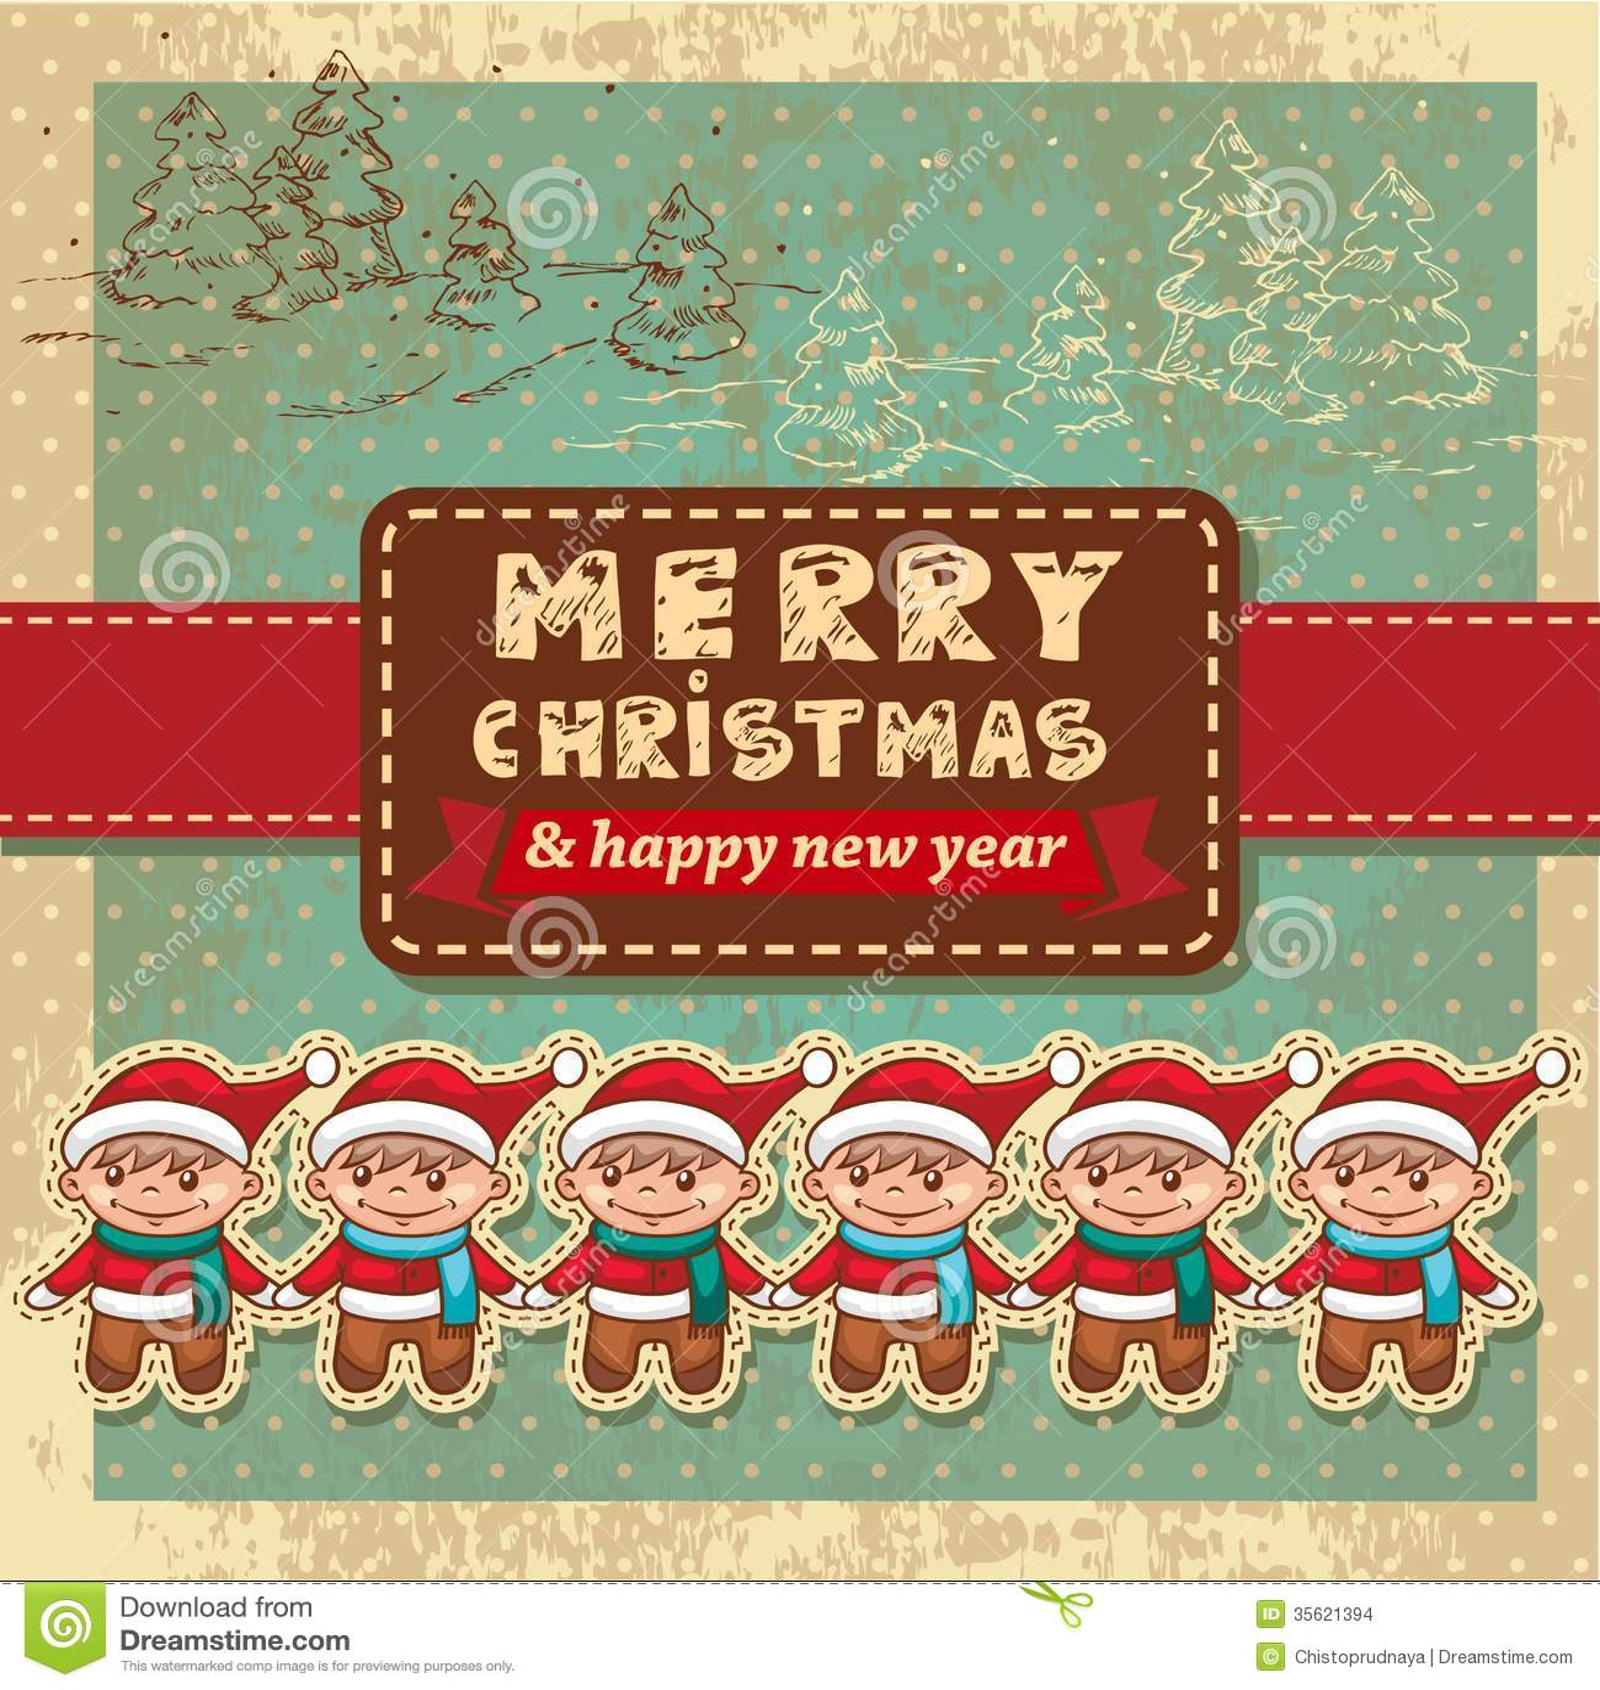 Vintage Retro Christmas Card Royalty Free Stock Photos - Image ...